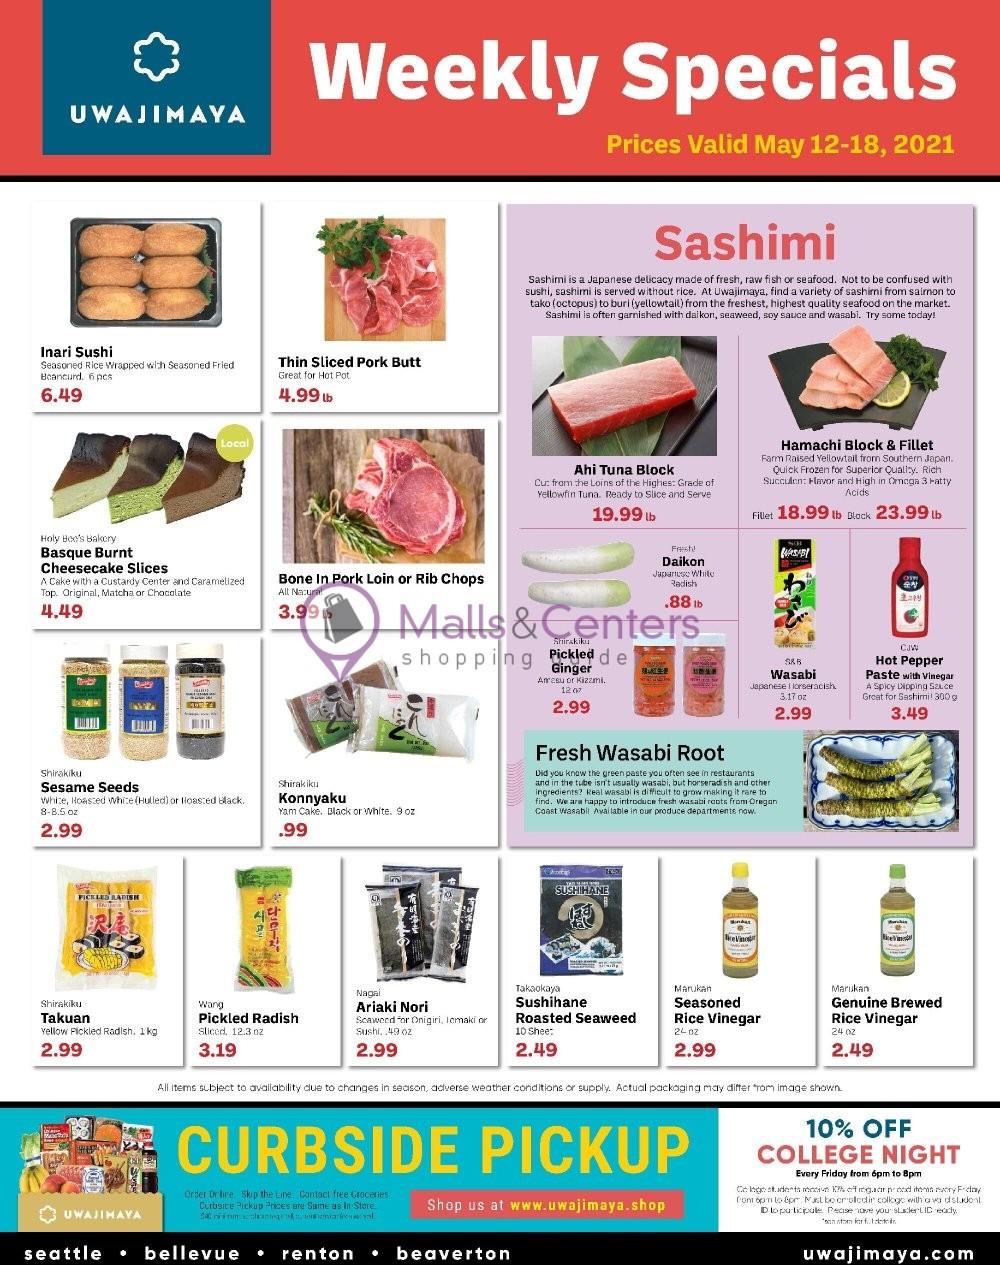 weekly ads Uwajimaya - page 1 - mallscenters.com